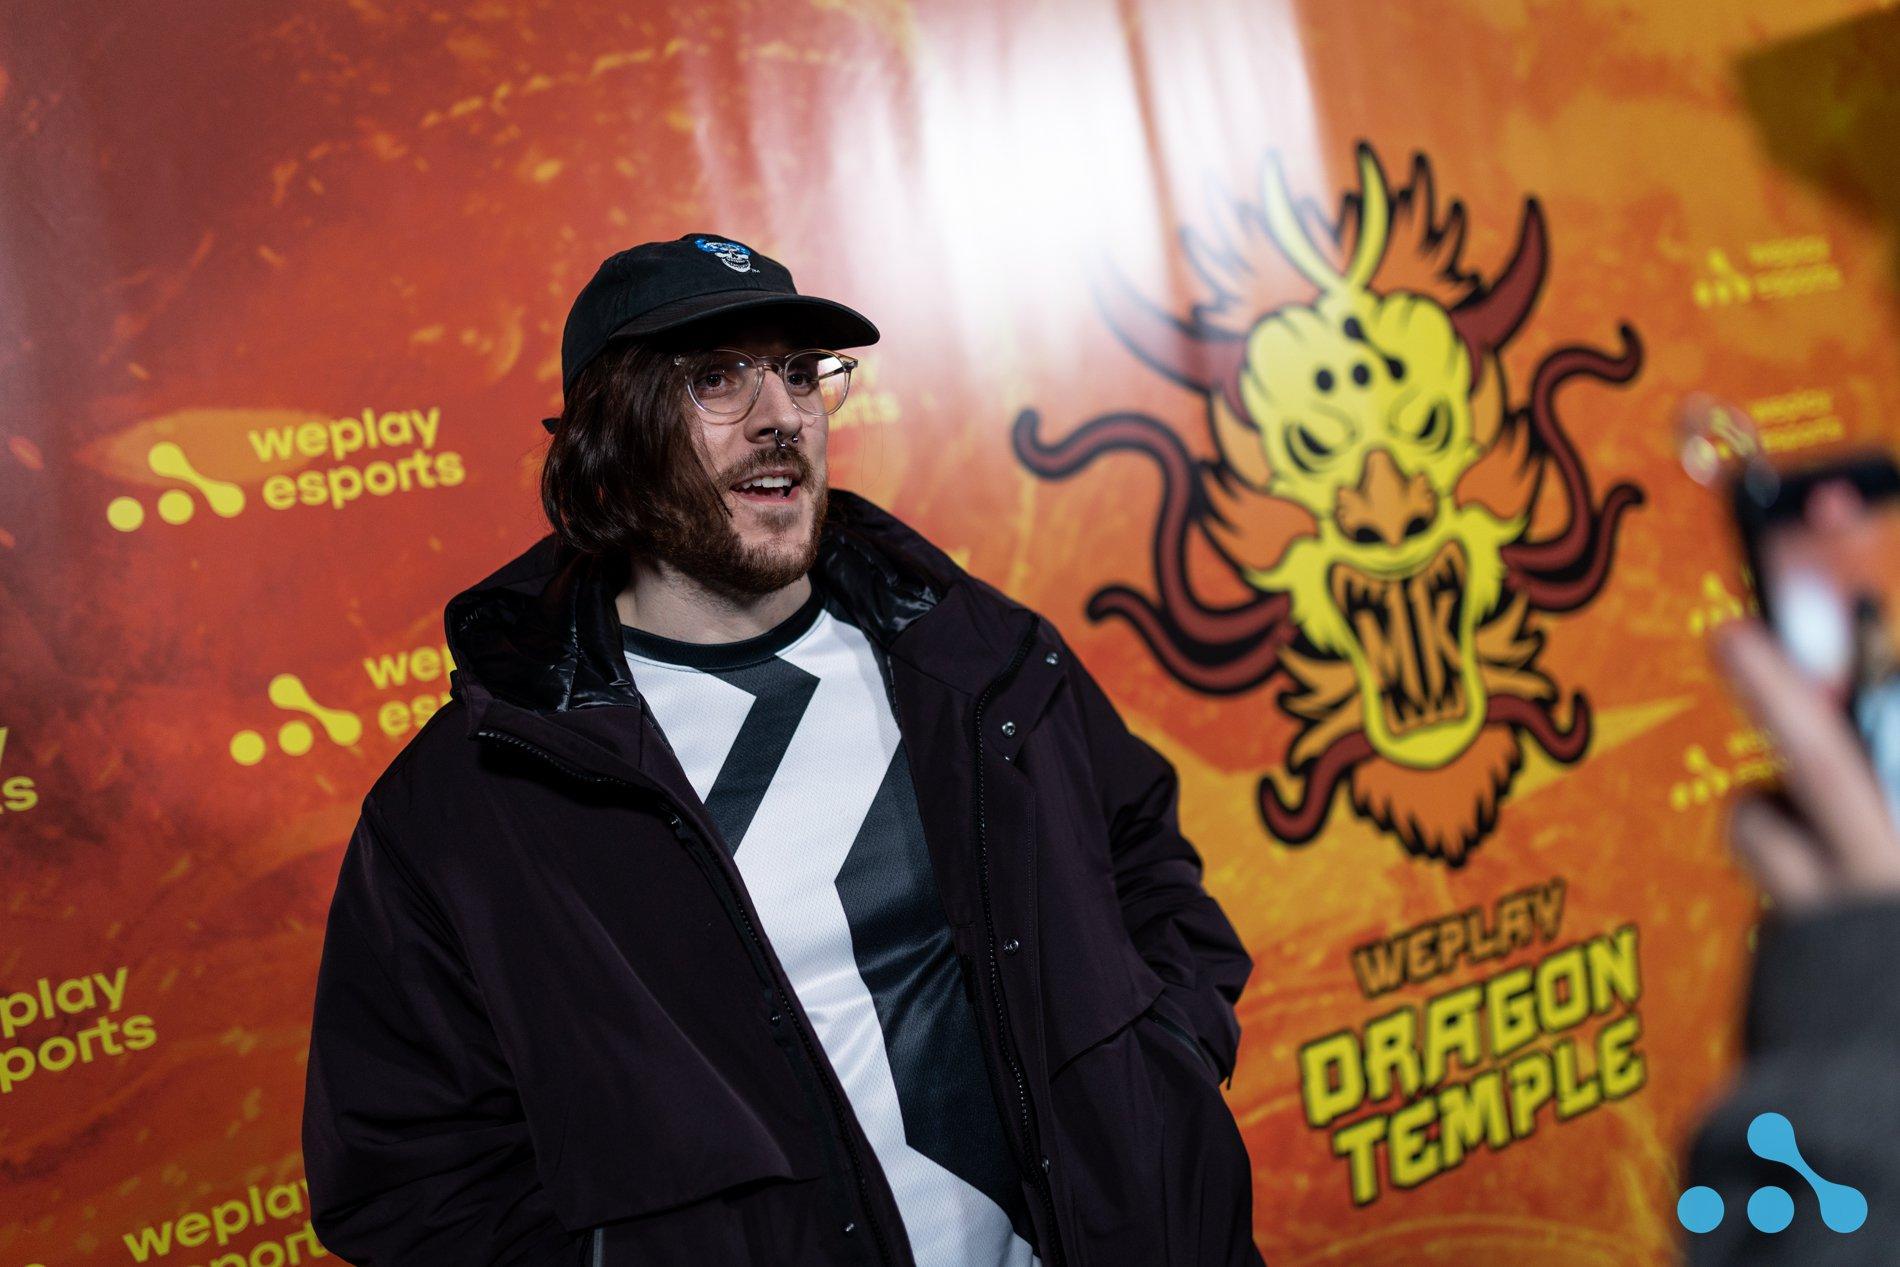 WePlay Dragon Temple photos